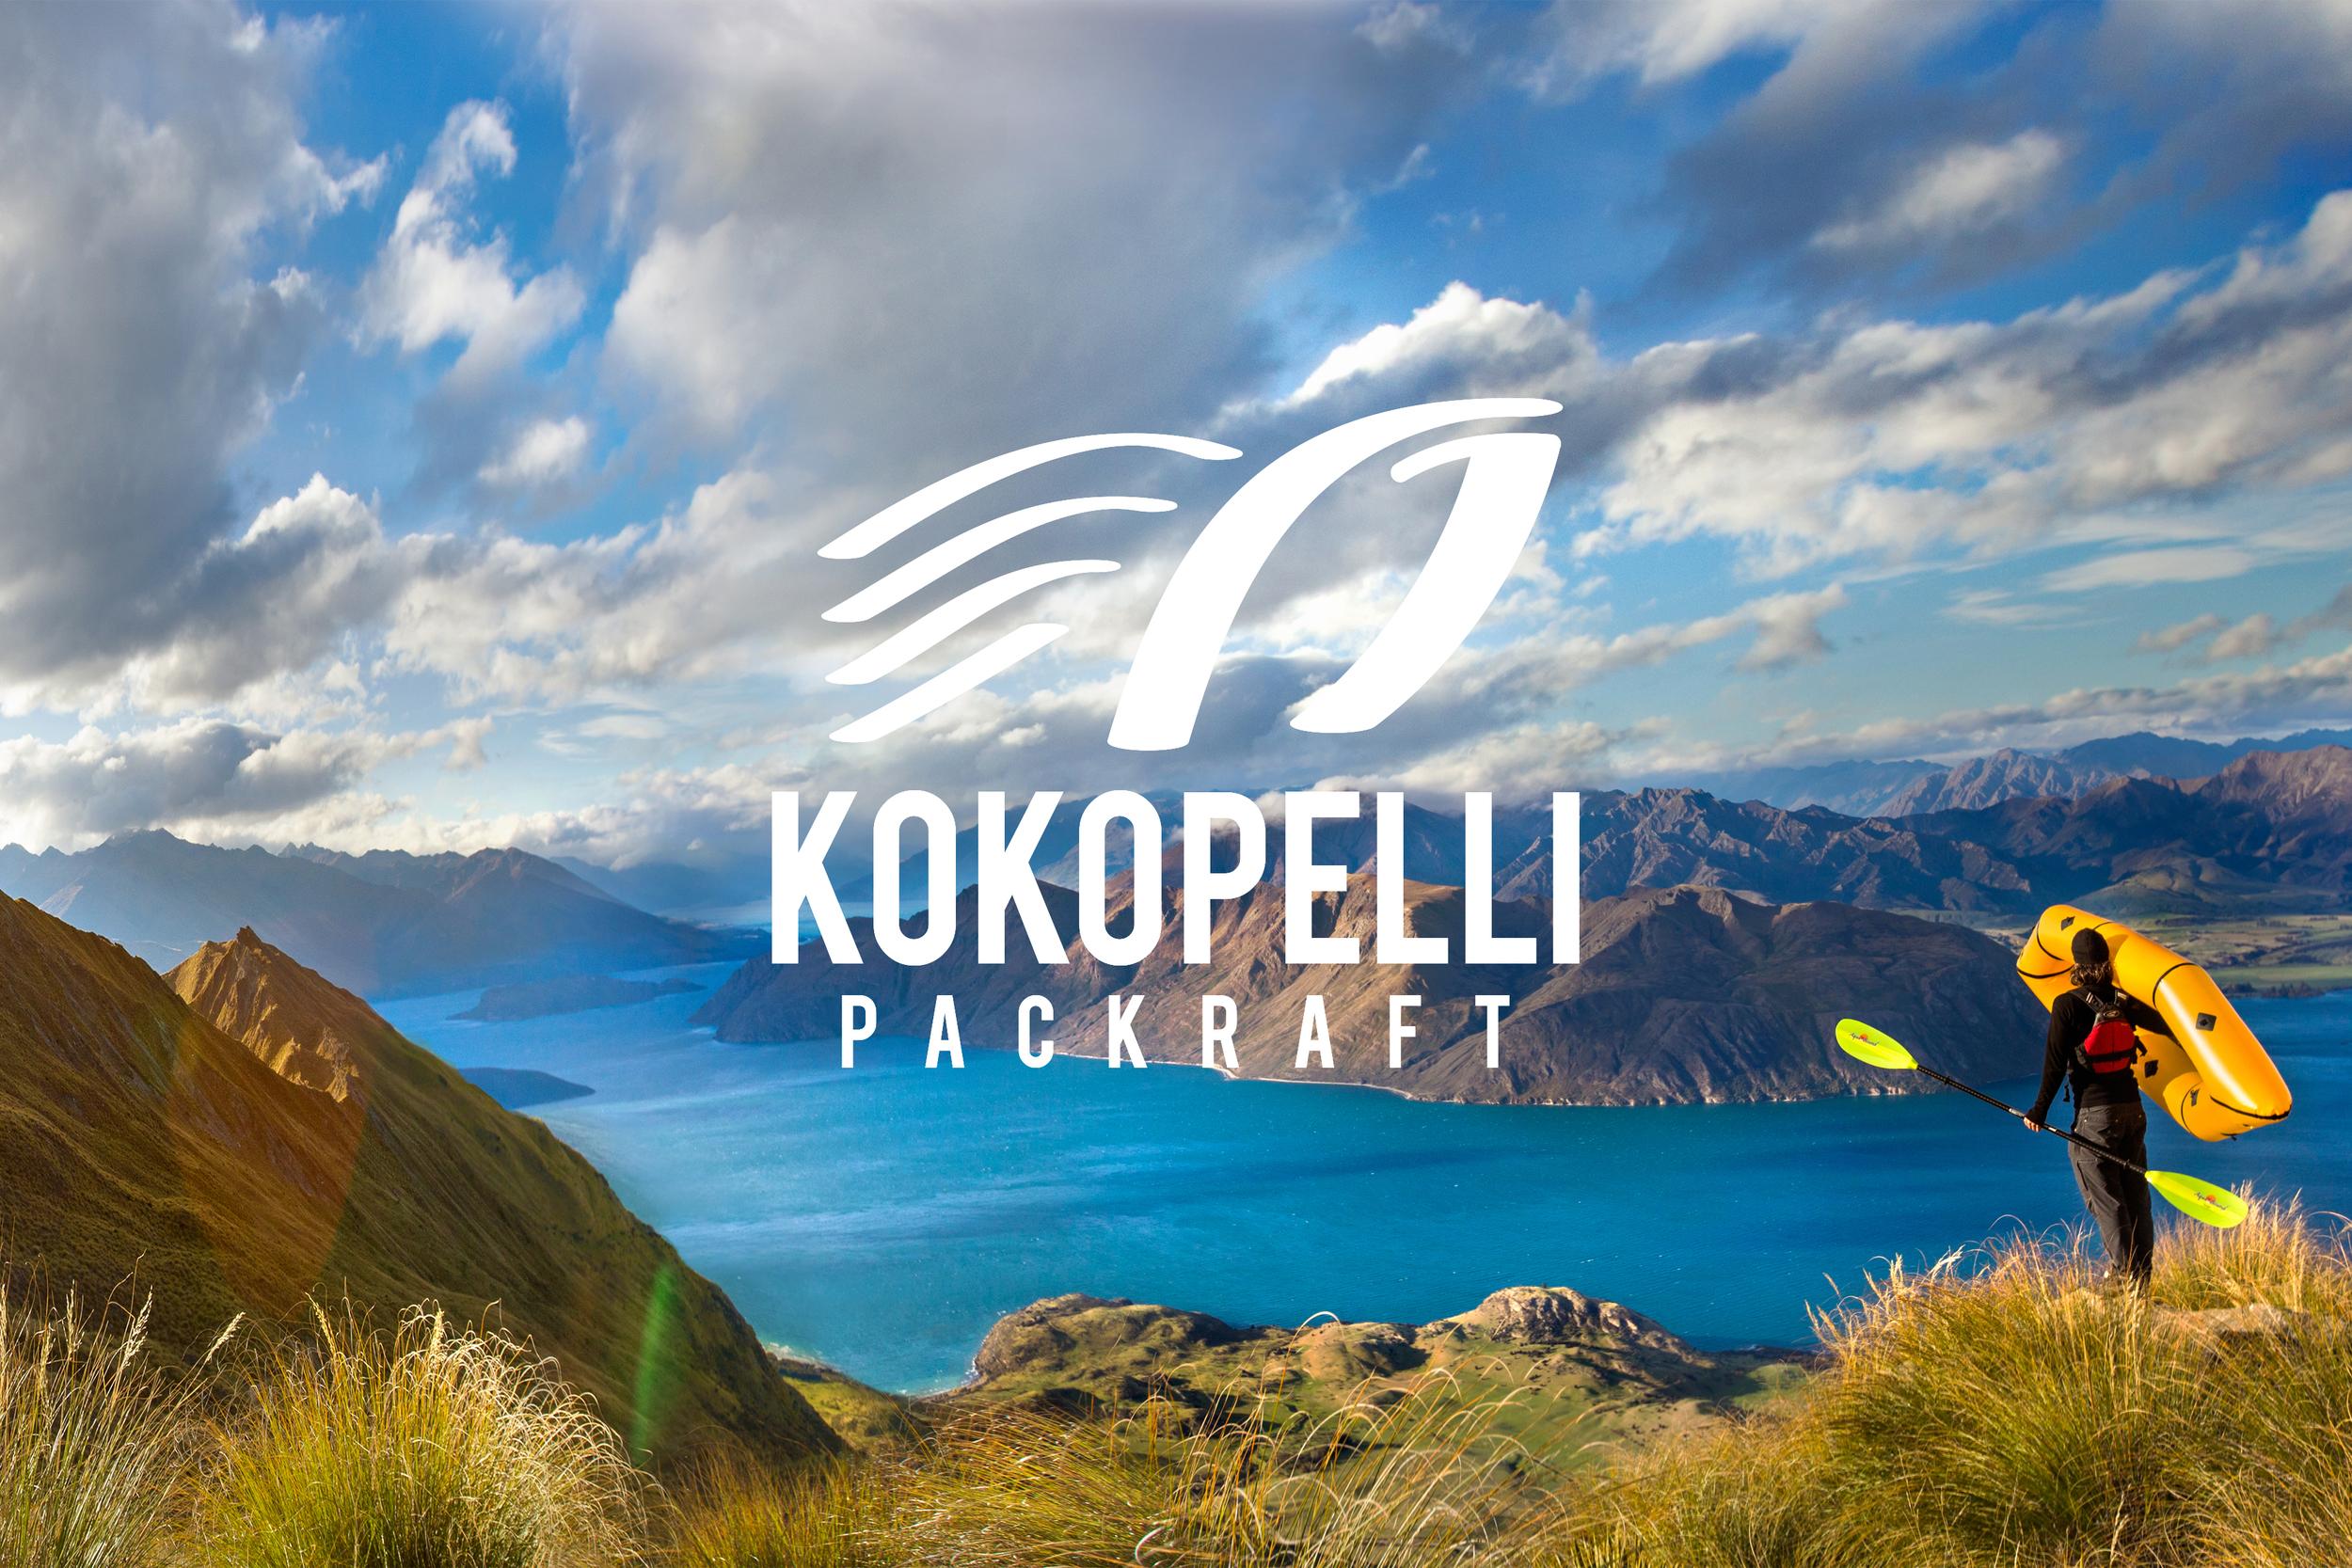 Kokopelli_Print_12.jpg